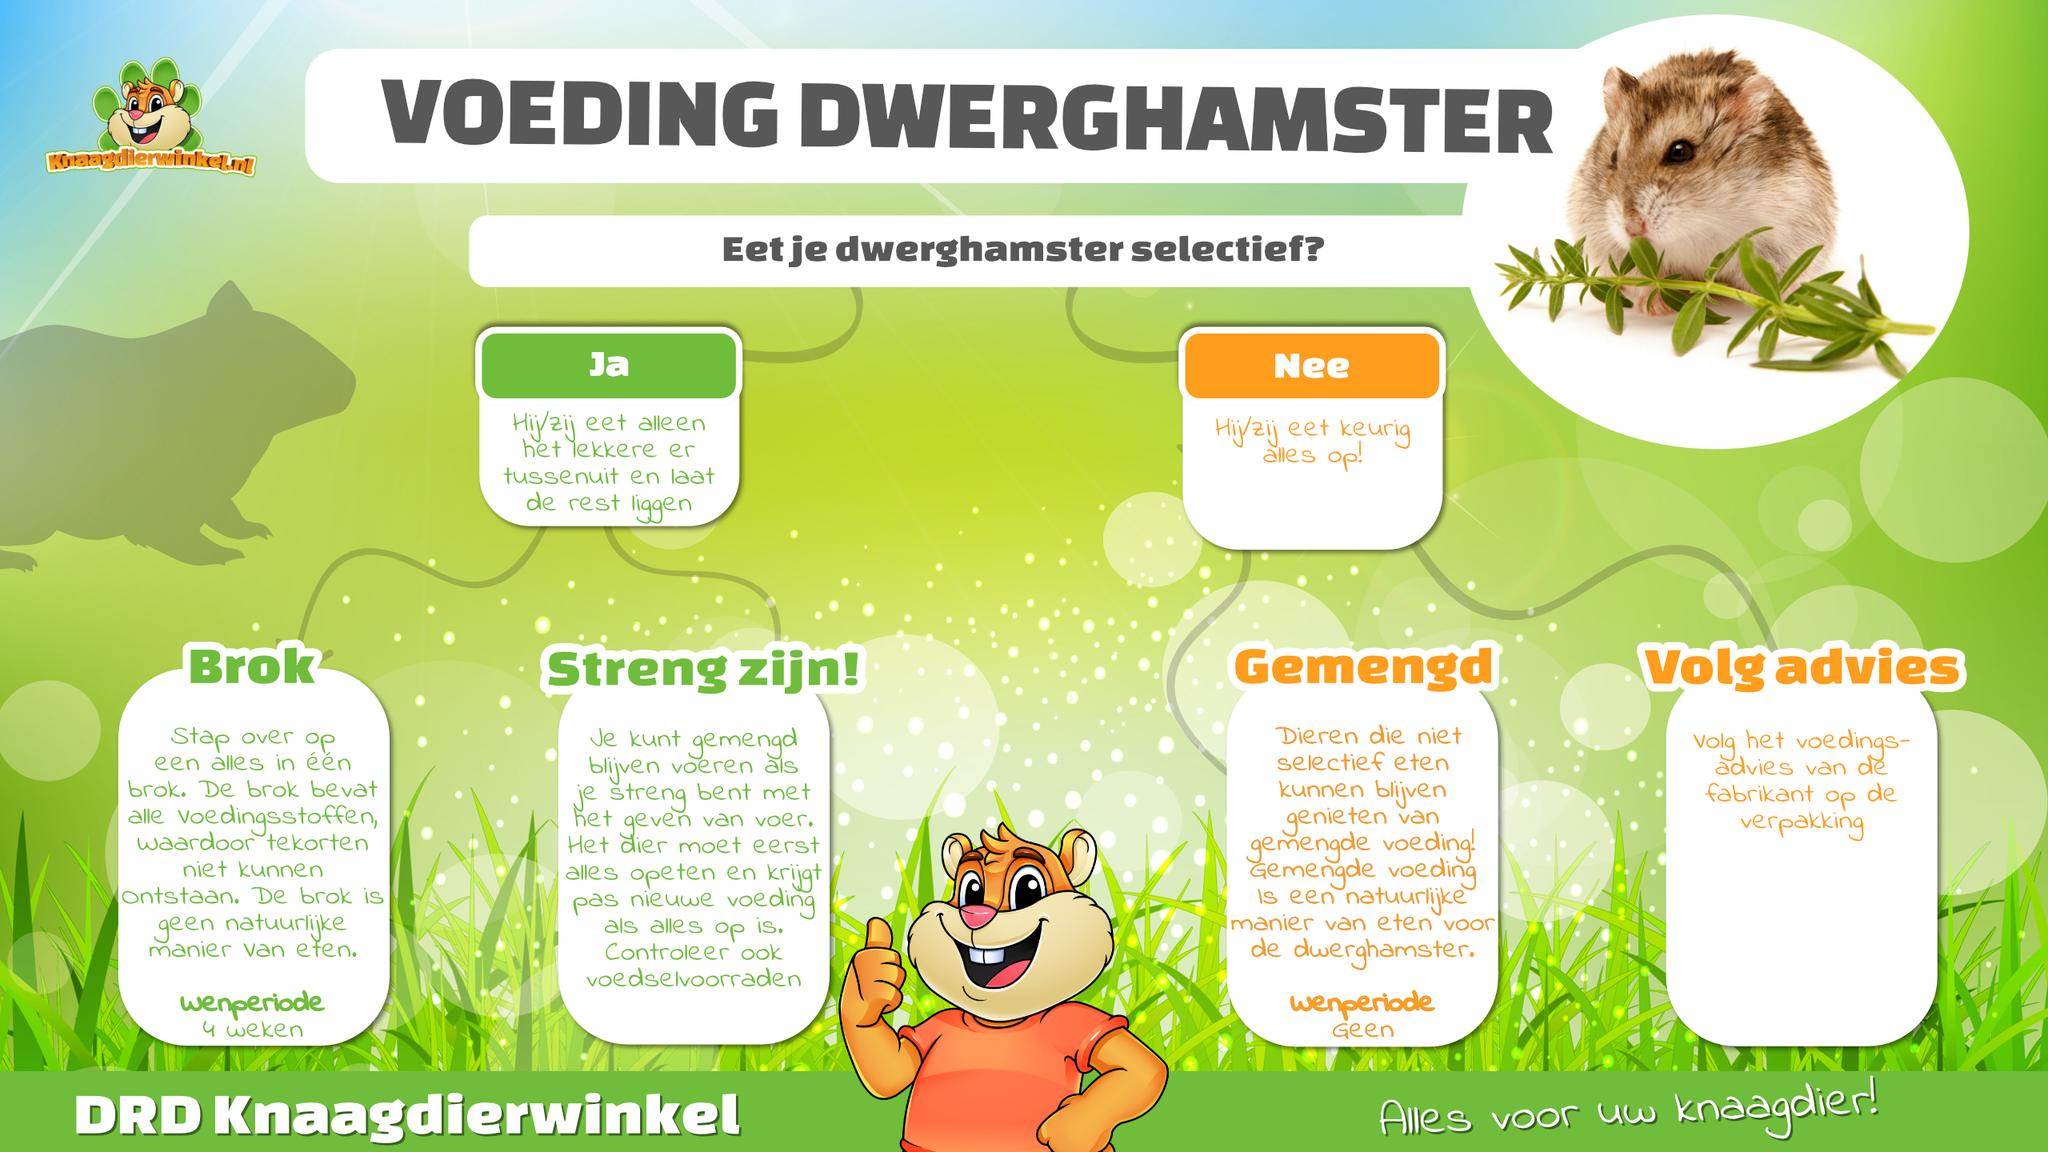 selectief eten dwerghamster hamster